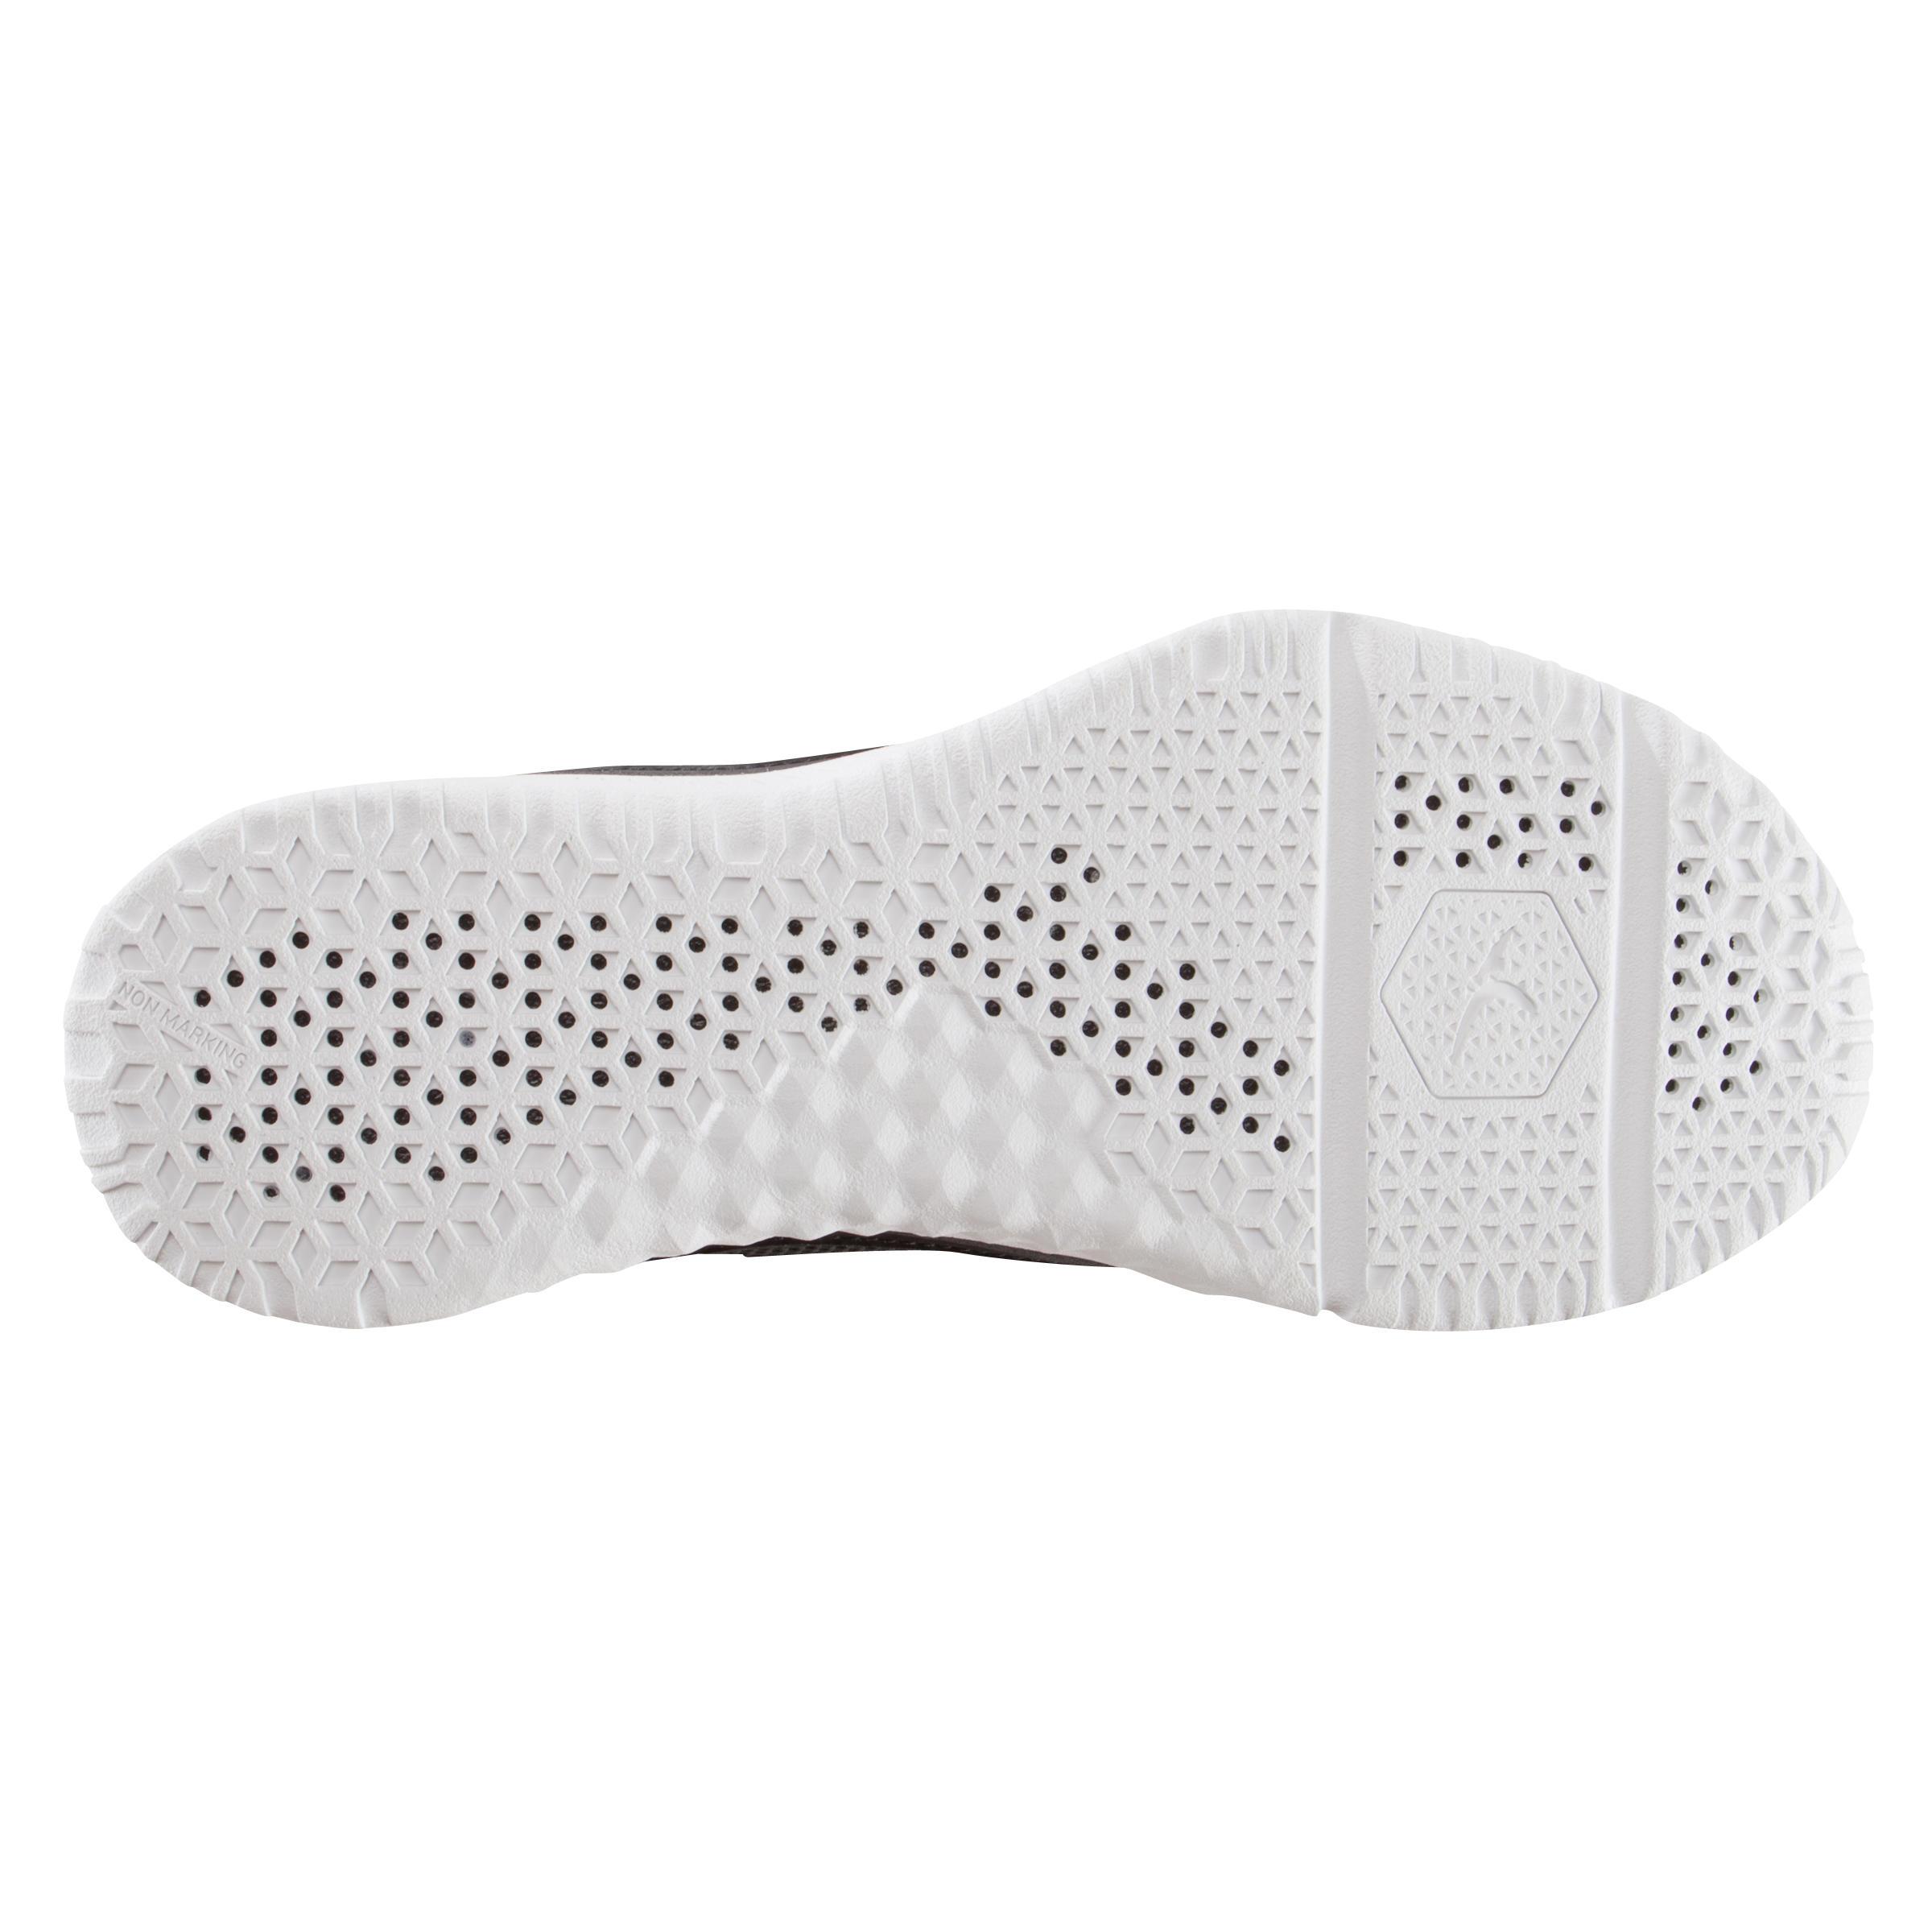 Strong 900 Women's Cross-Training Shoes - Black/White